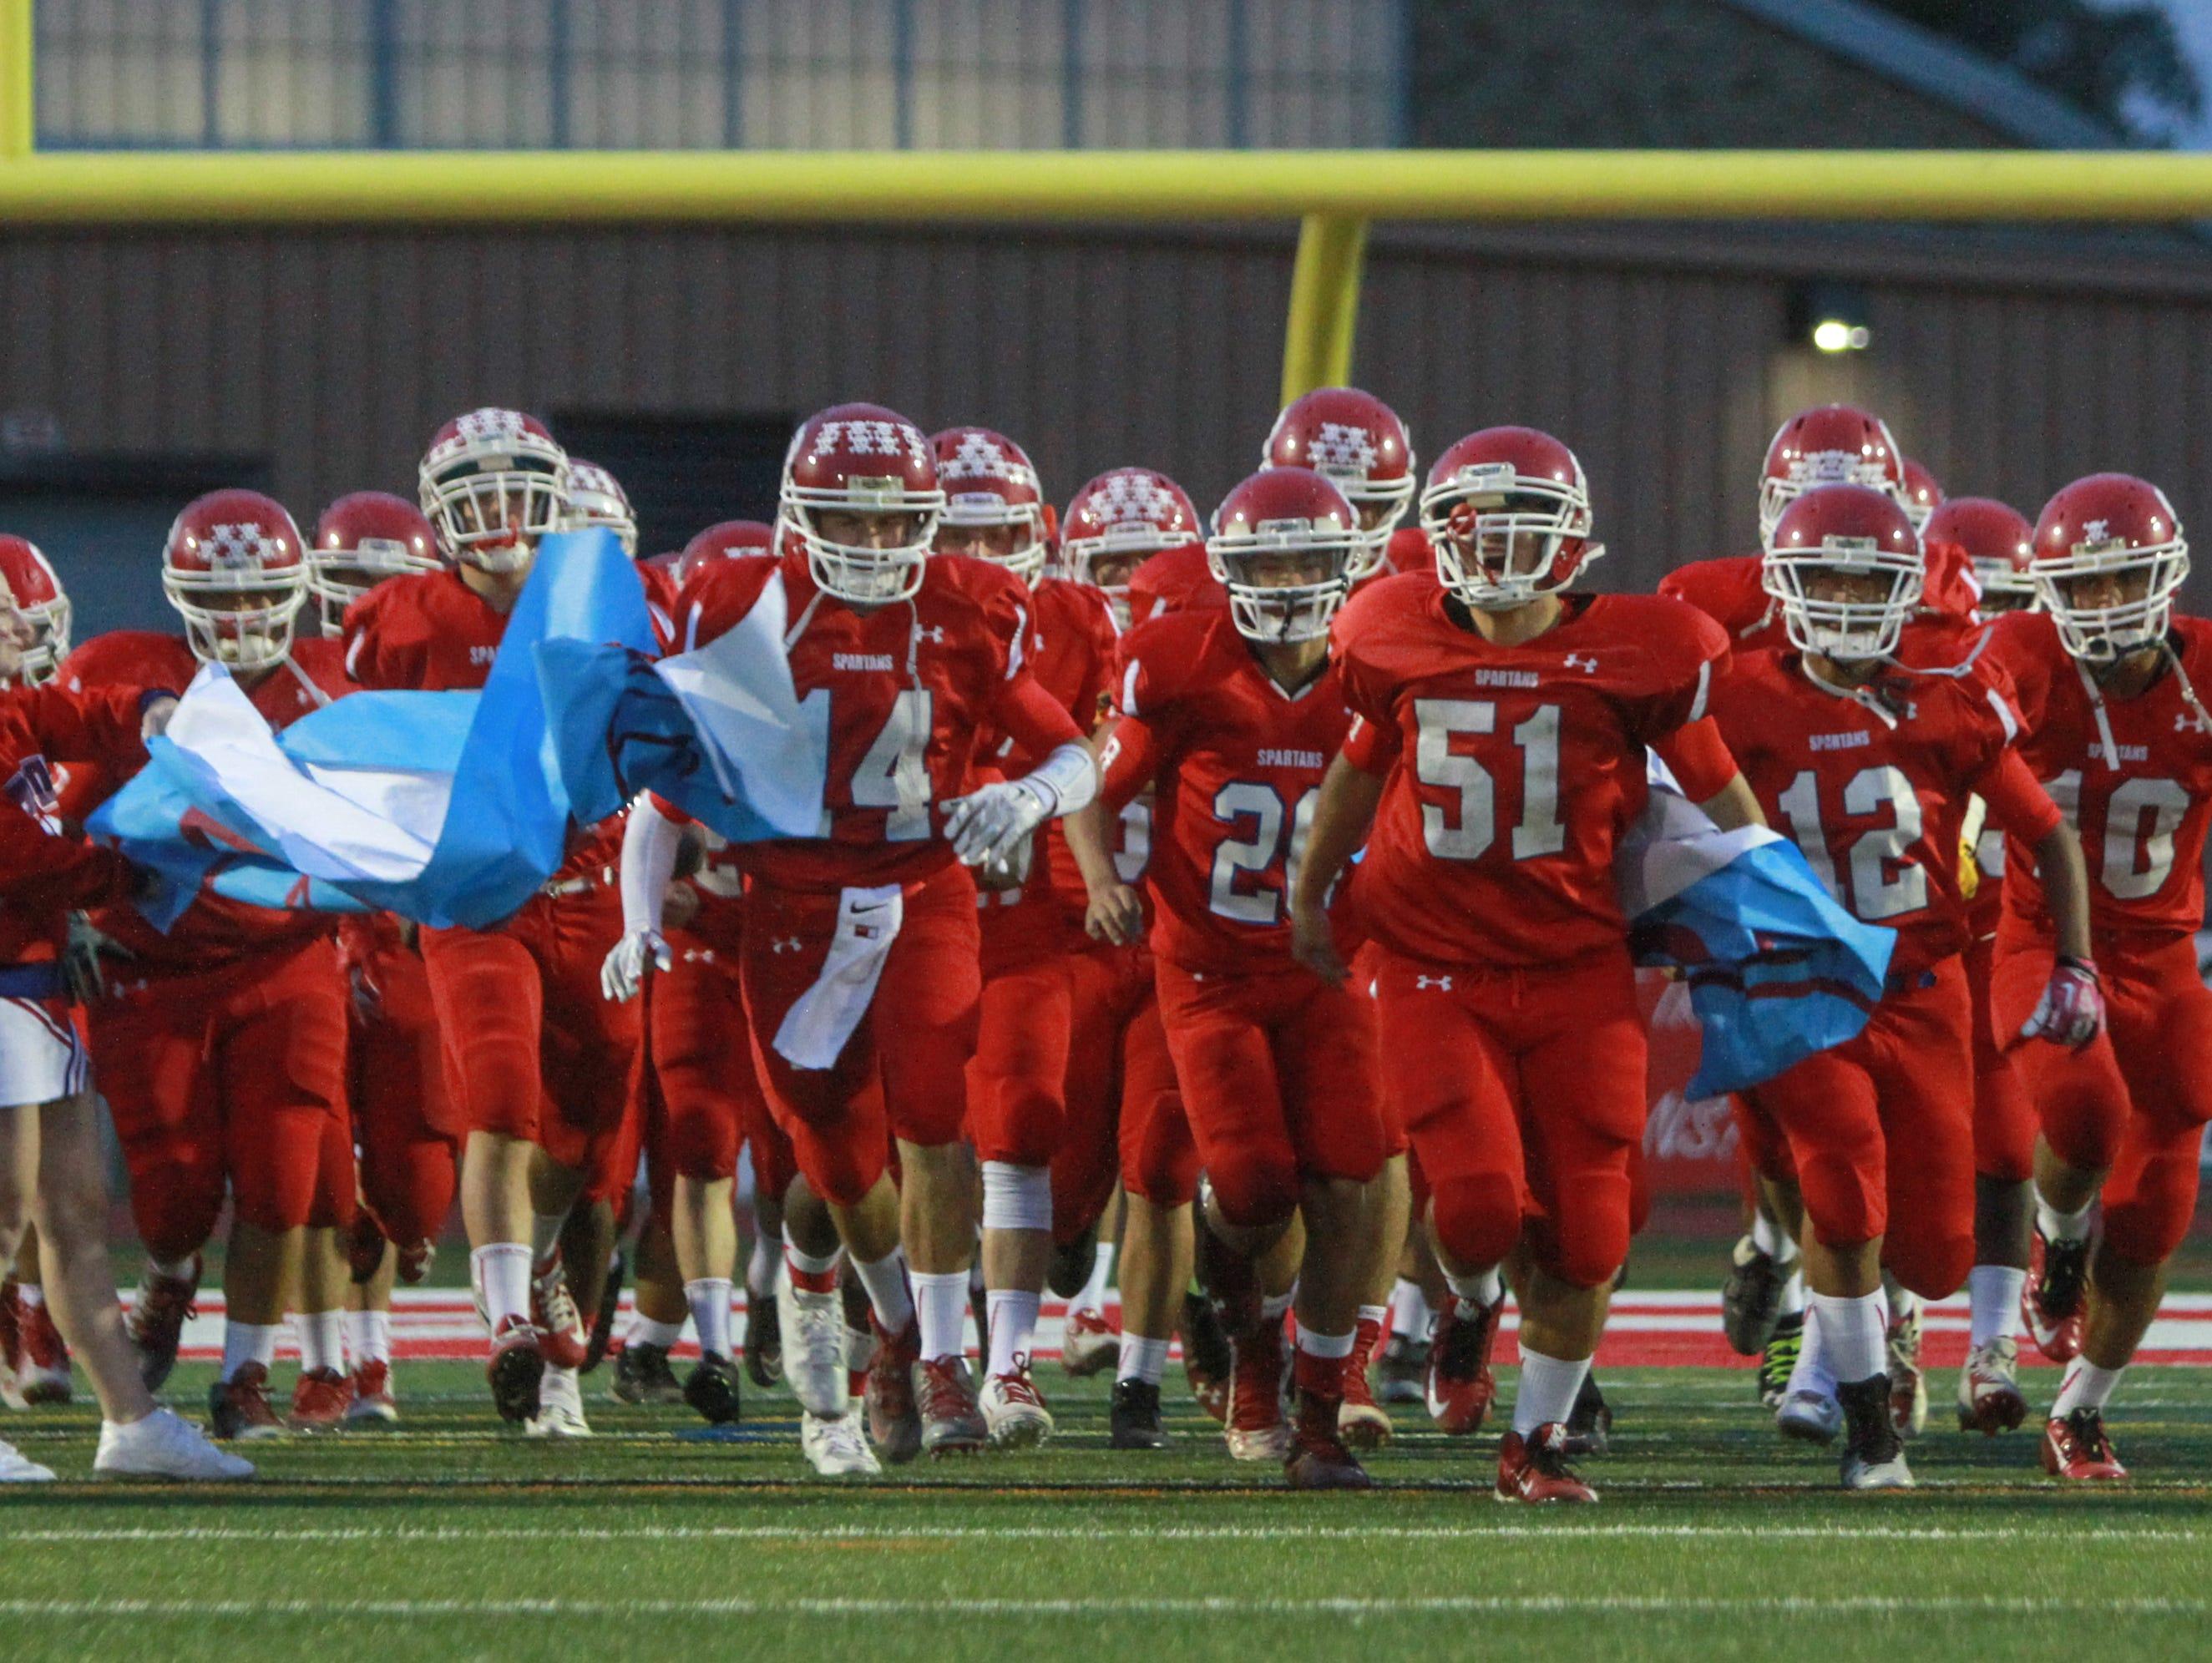 Ocean, NJ Red Bank at Ocean Friday night football. Ocean enters the field 092415